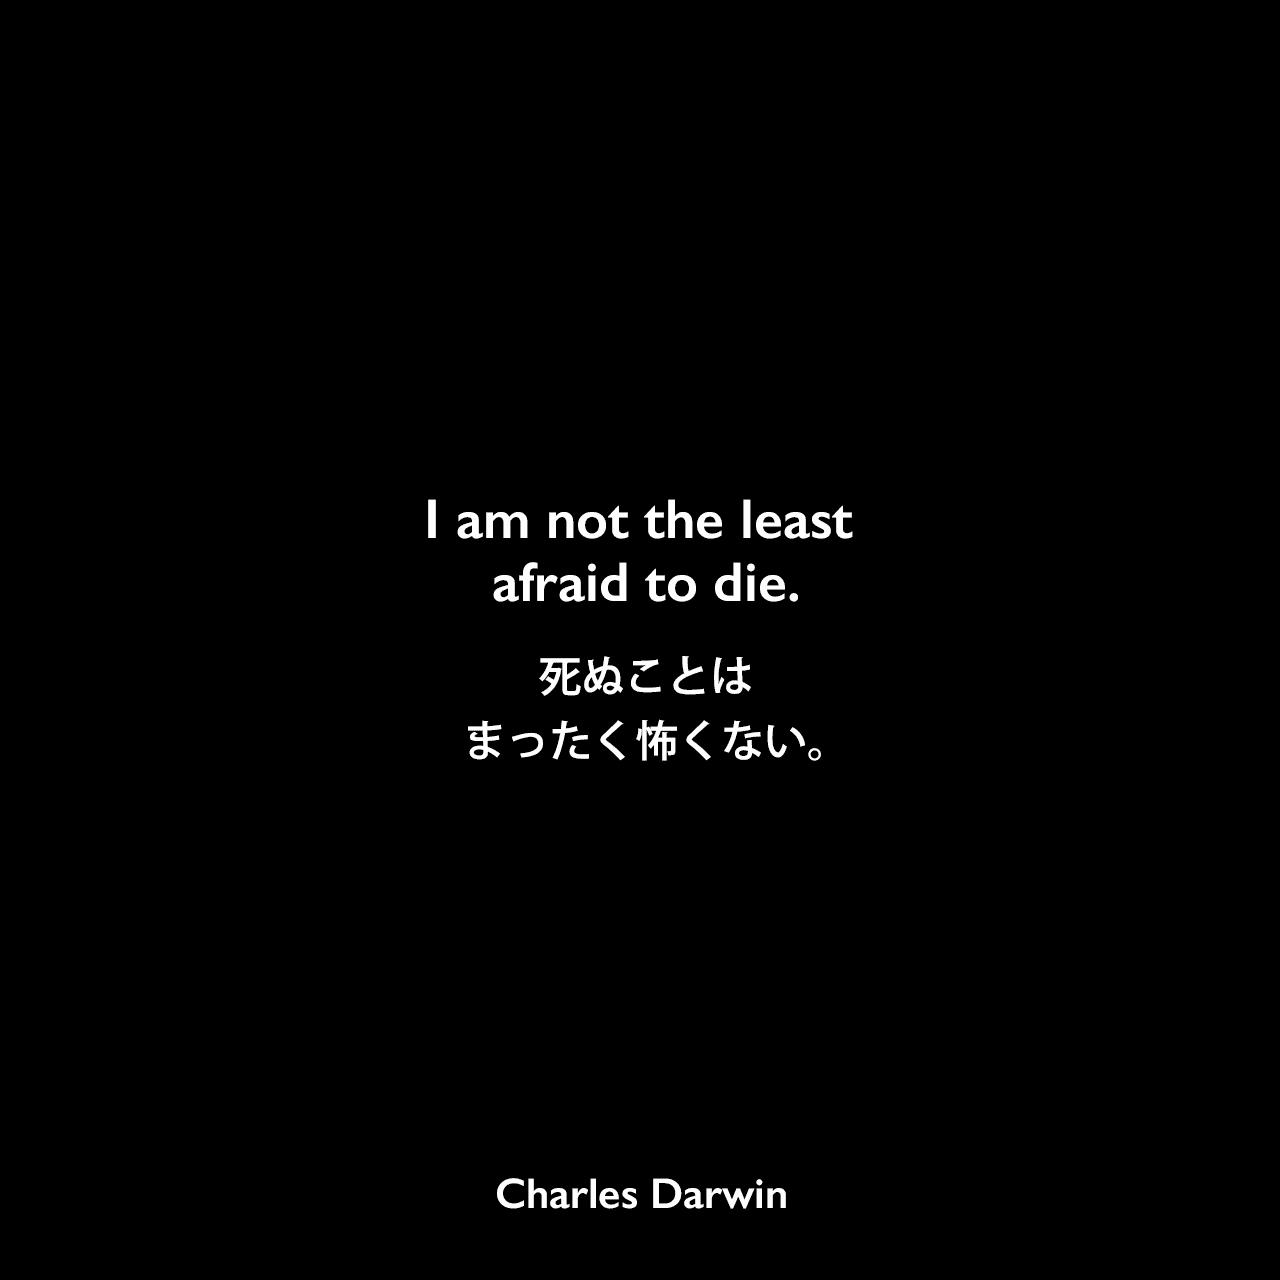 I am not the least afraid to die.死ぬことは、まったく怖くない。Charles Darwin